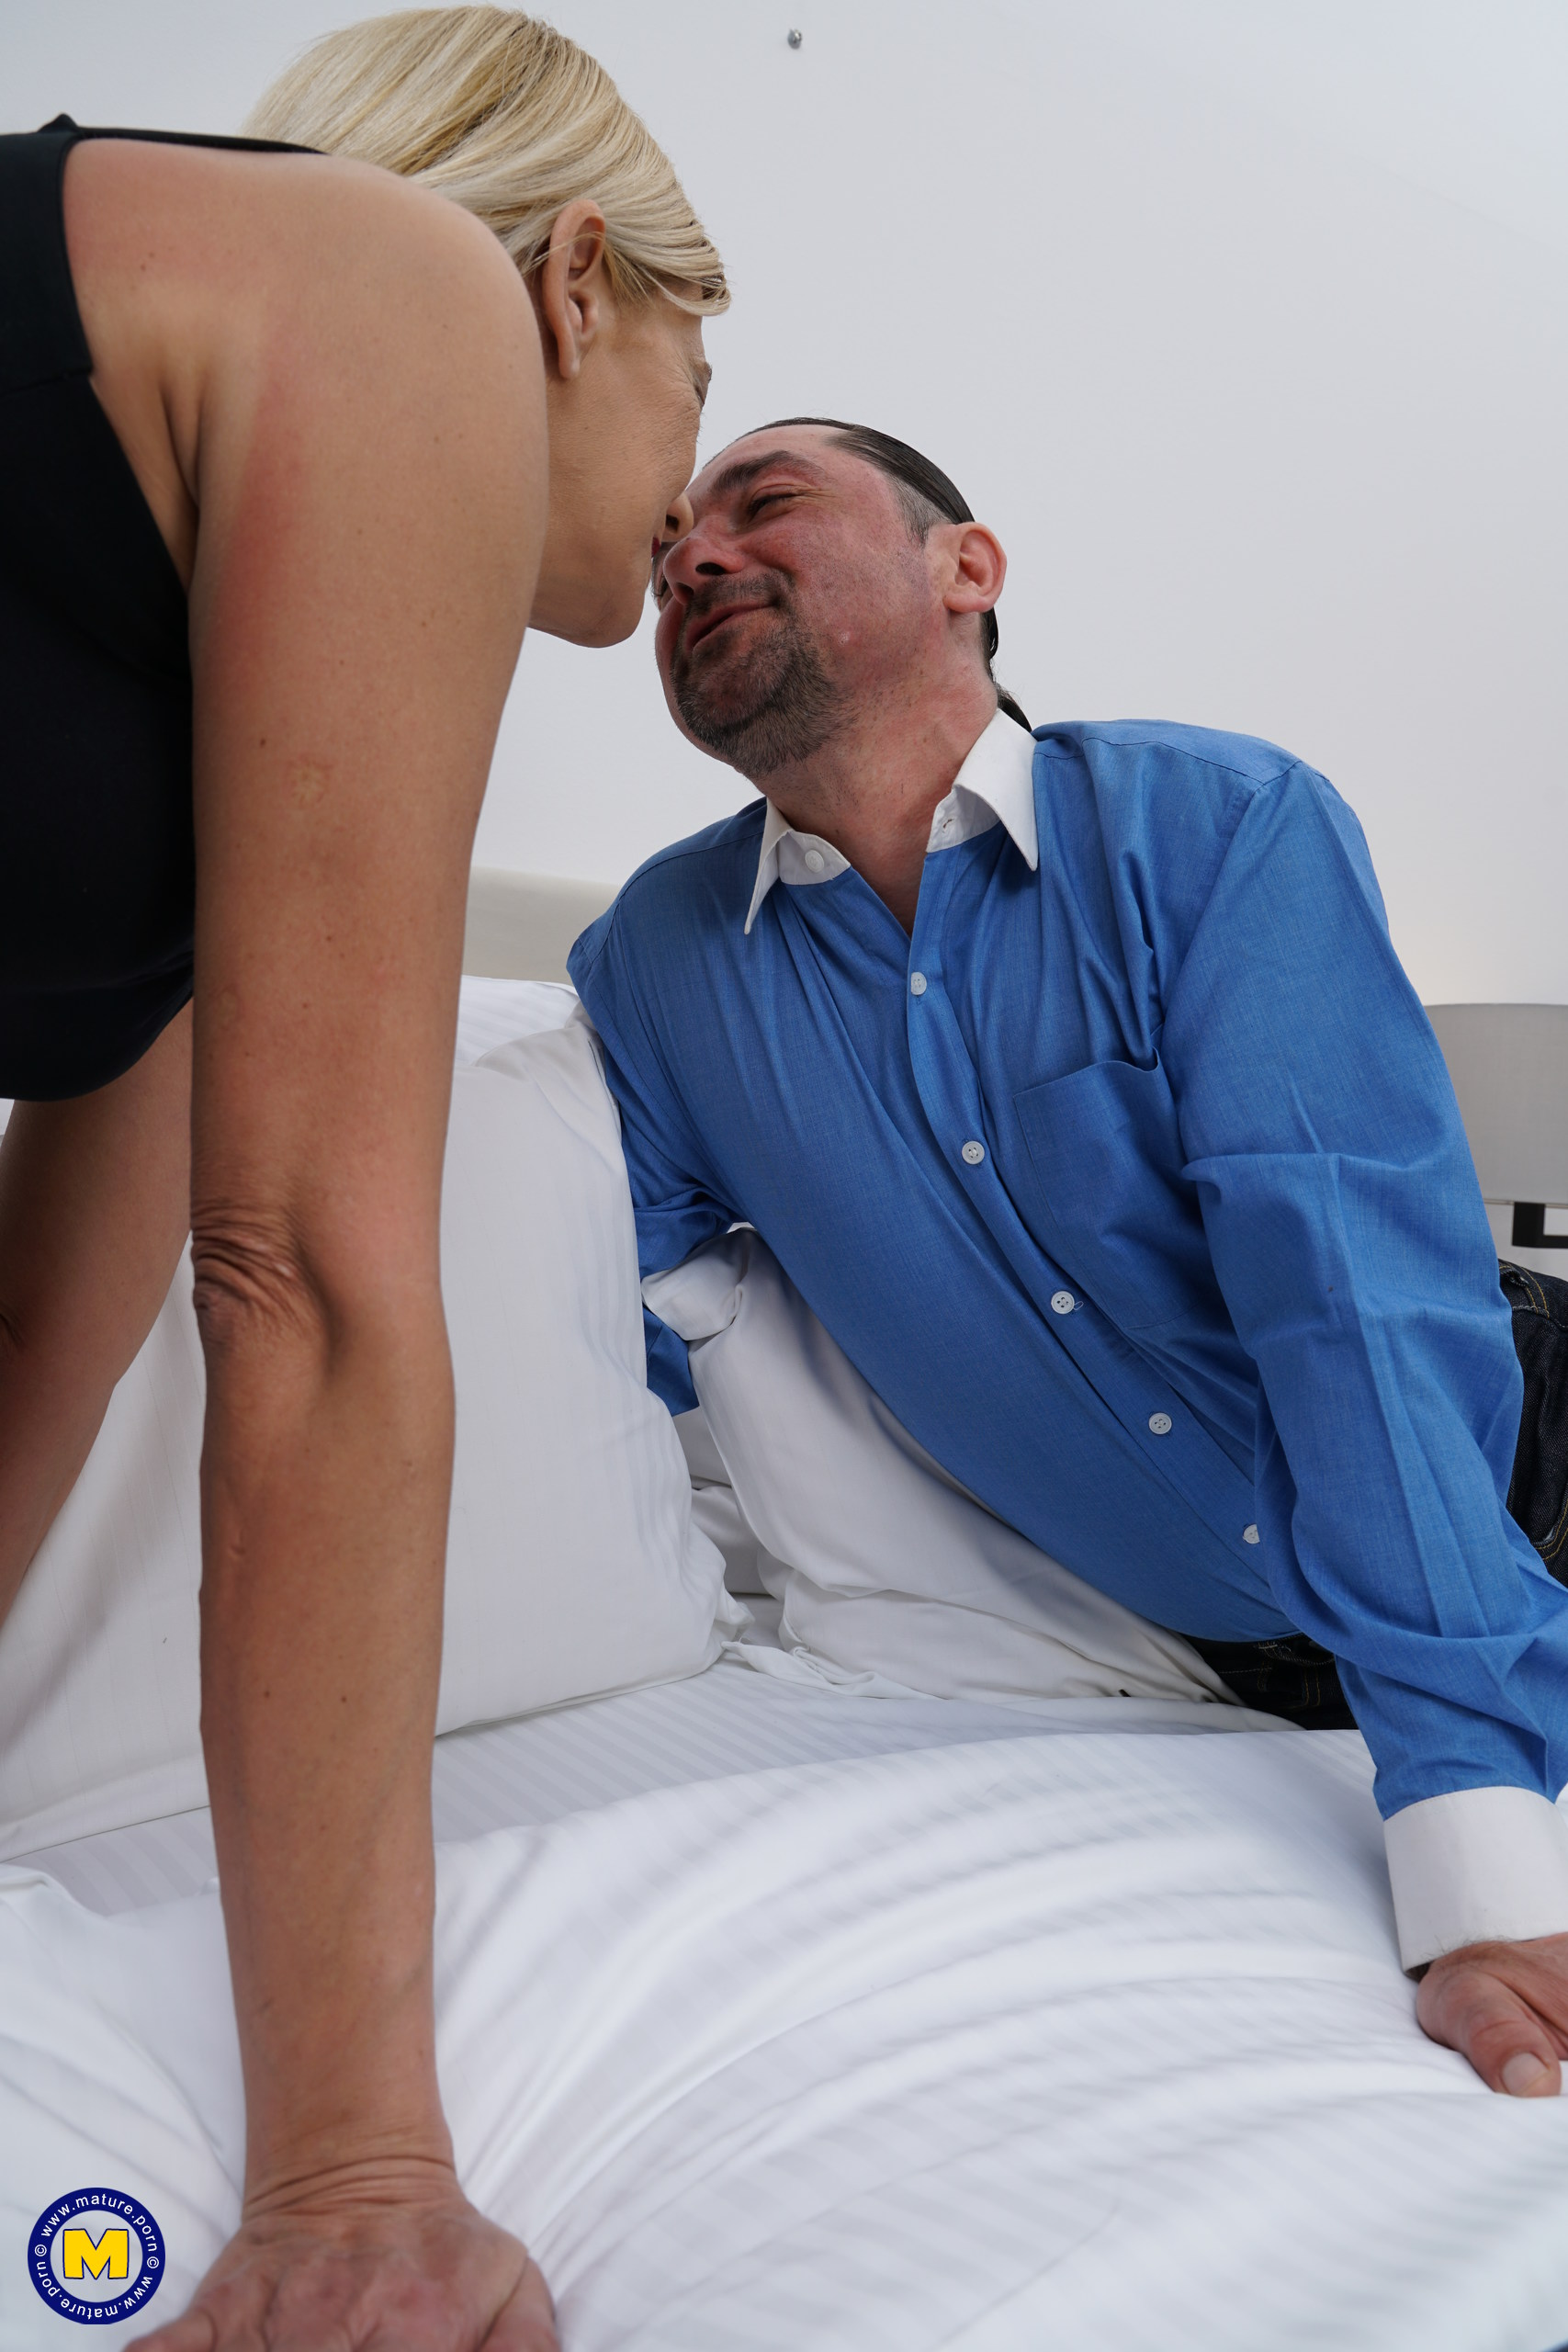 naughty mature slut the mature lady porn blog